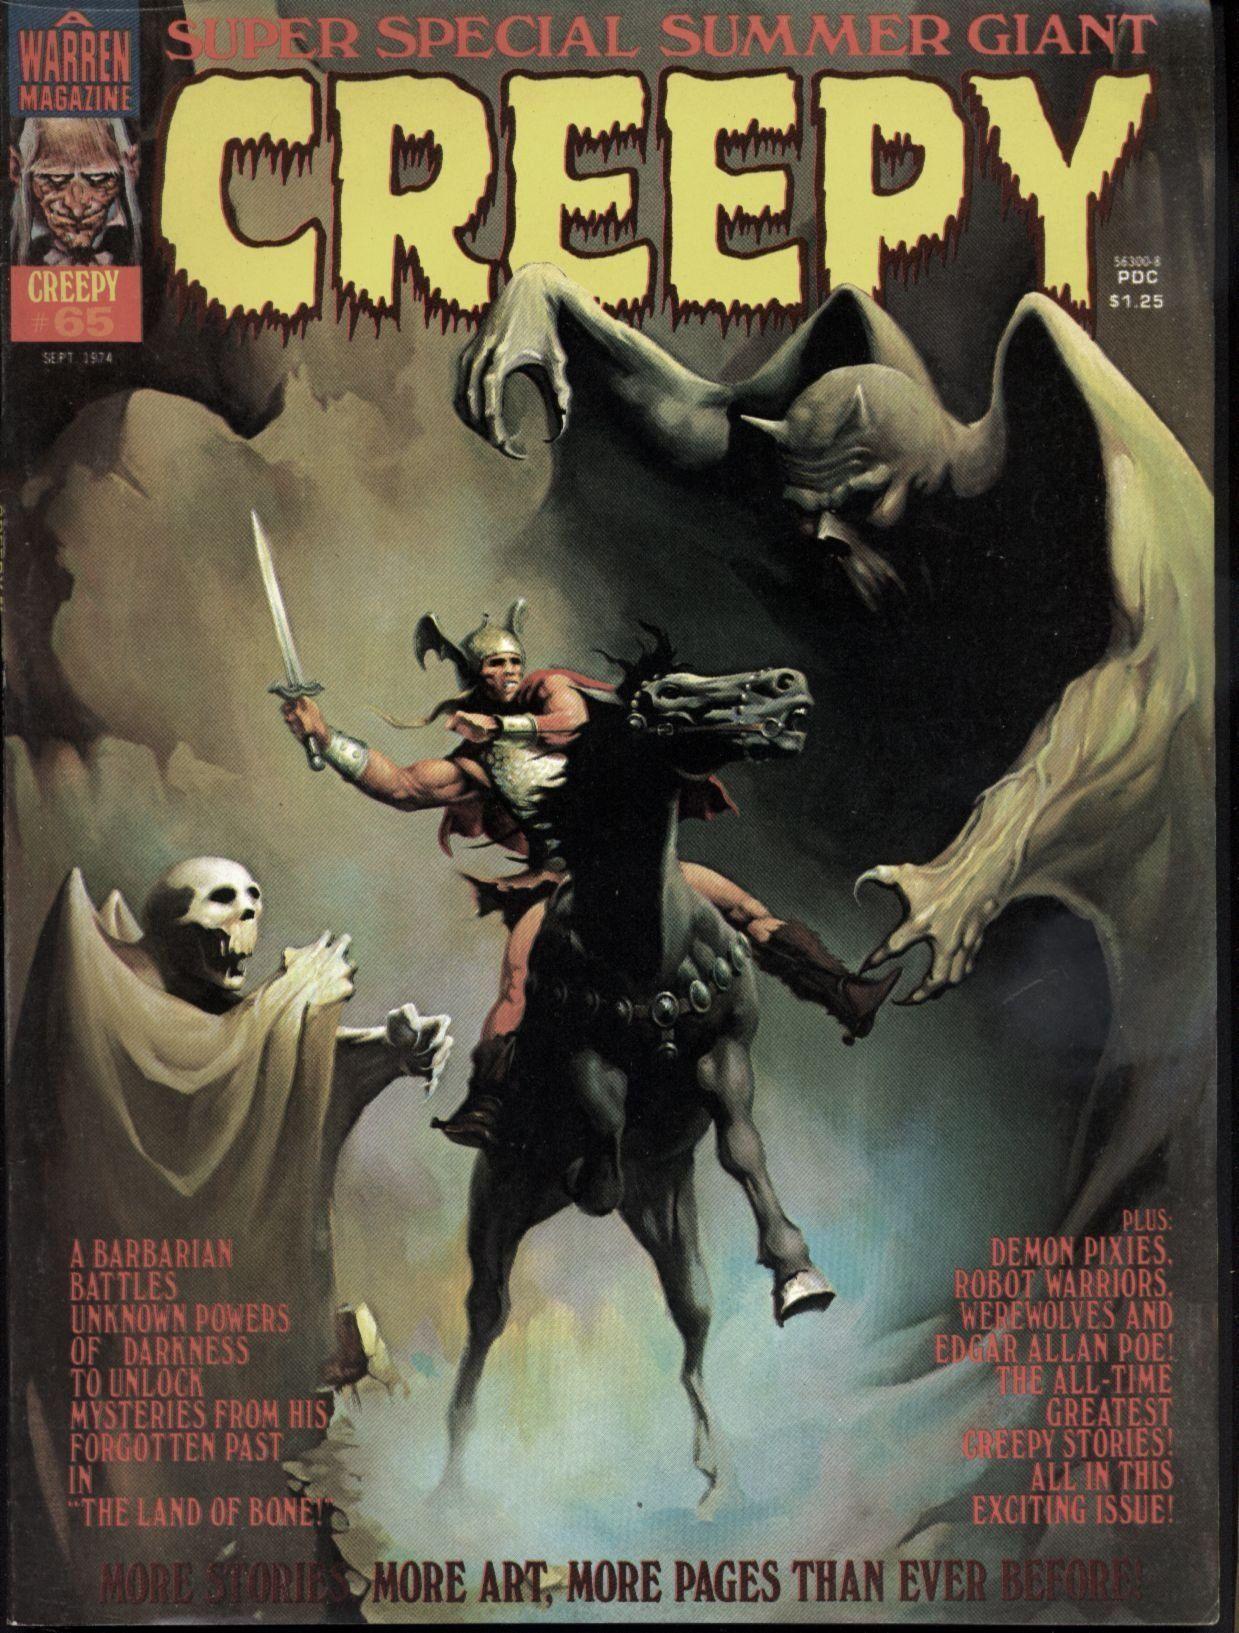 Creepy 65 1974 Annual Warren Horror Magazine Jose Bea Brocal Reed Crandall Jorge Galves Luis Garcia Esteban Maroto Felix Mas Ramon Torrents Creepy Comics Creepy Pulp Fiction Book